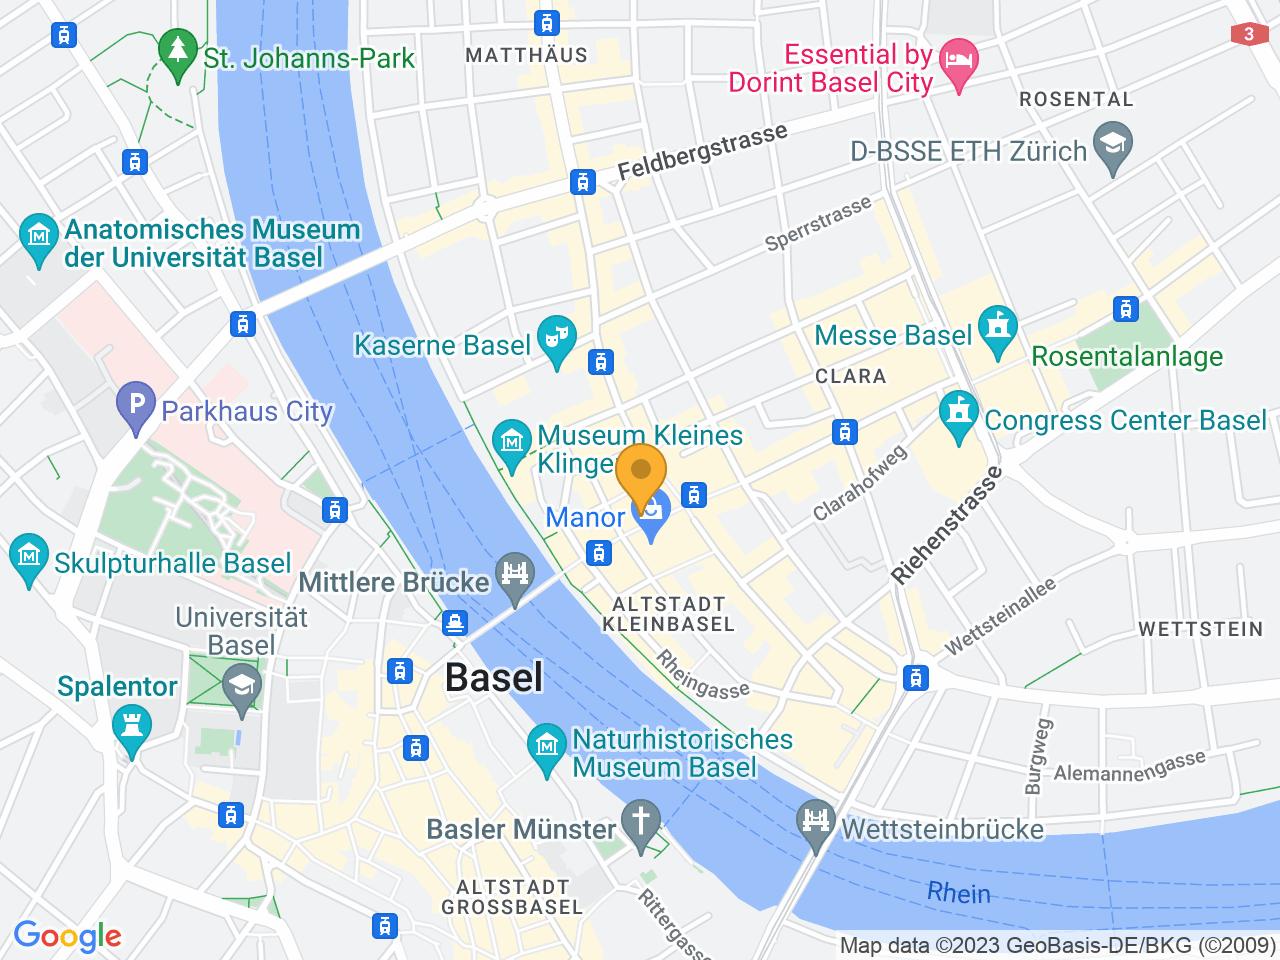 Greifengasse 17, 4058 Basel